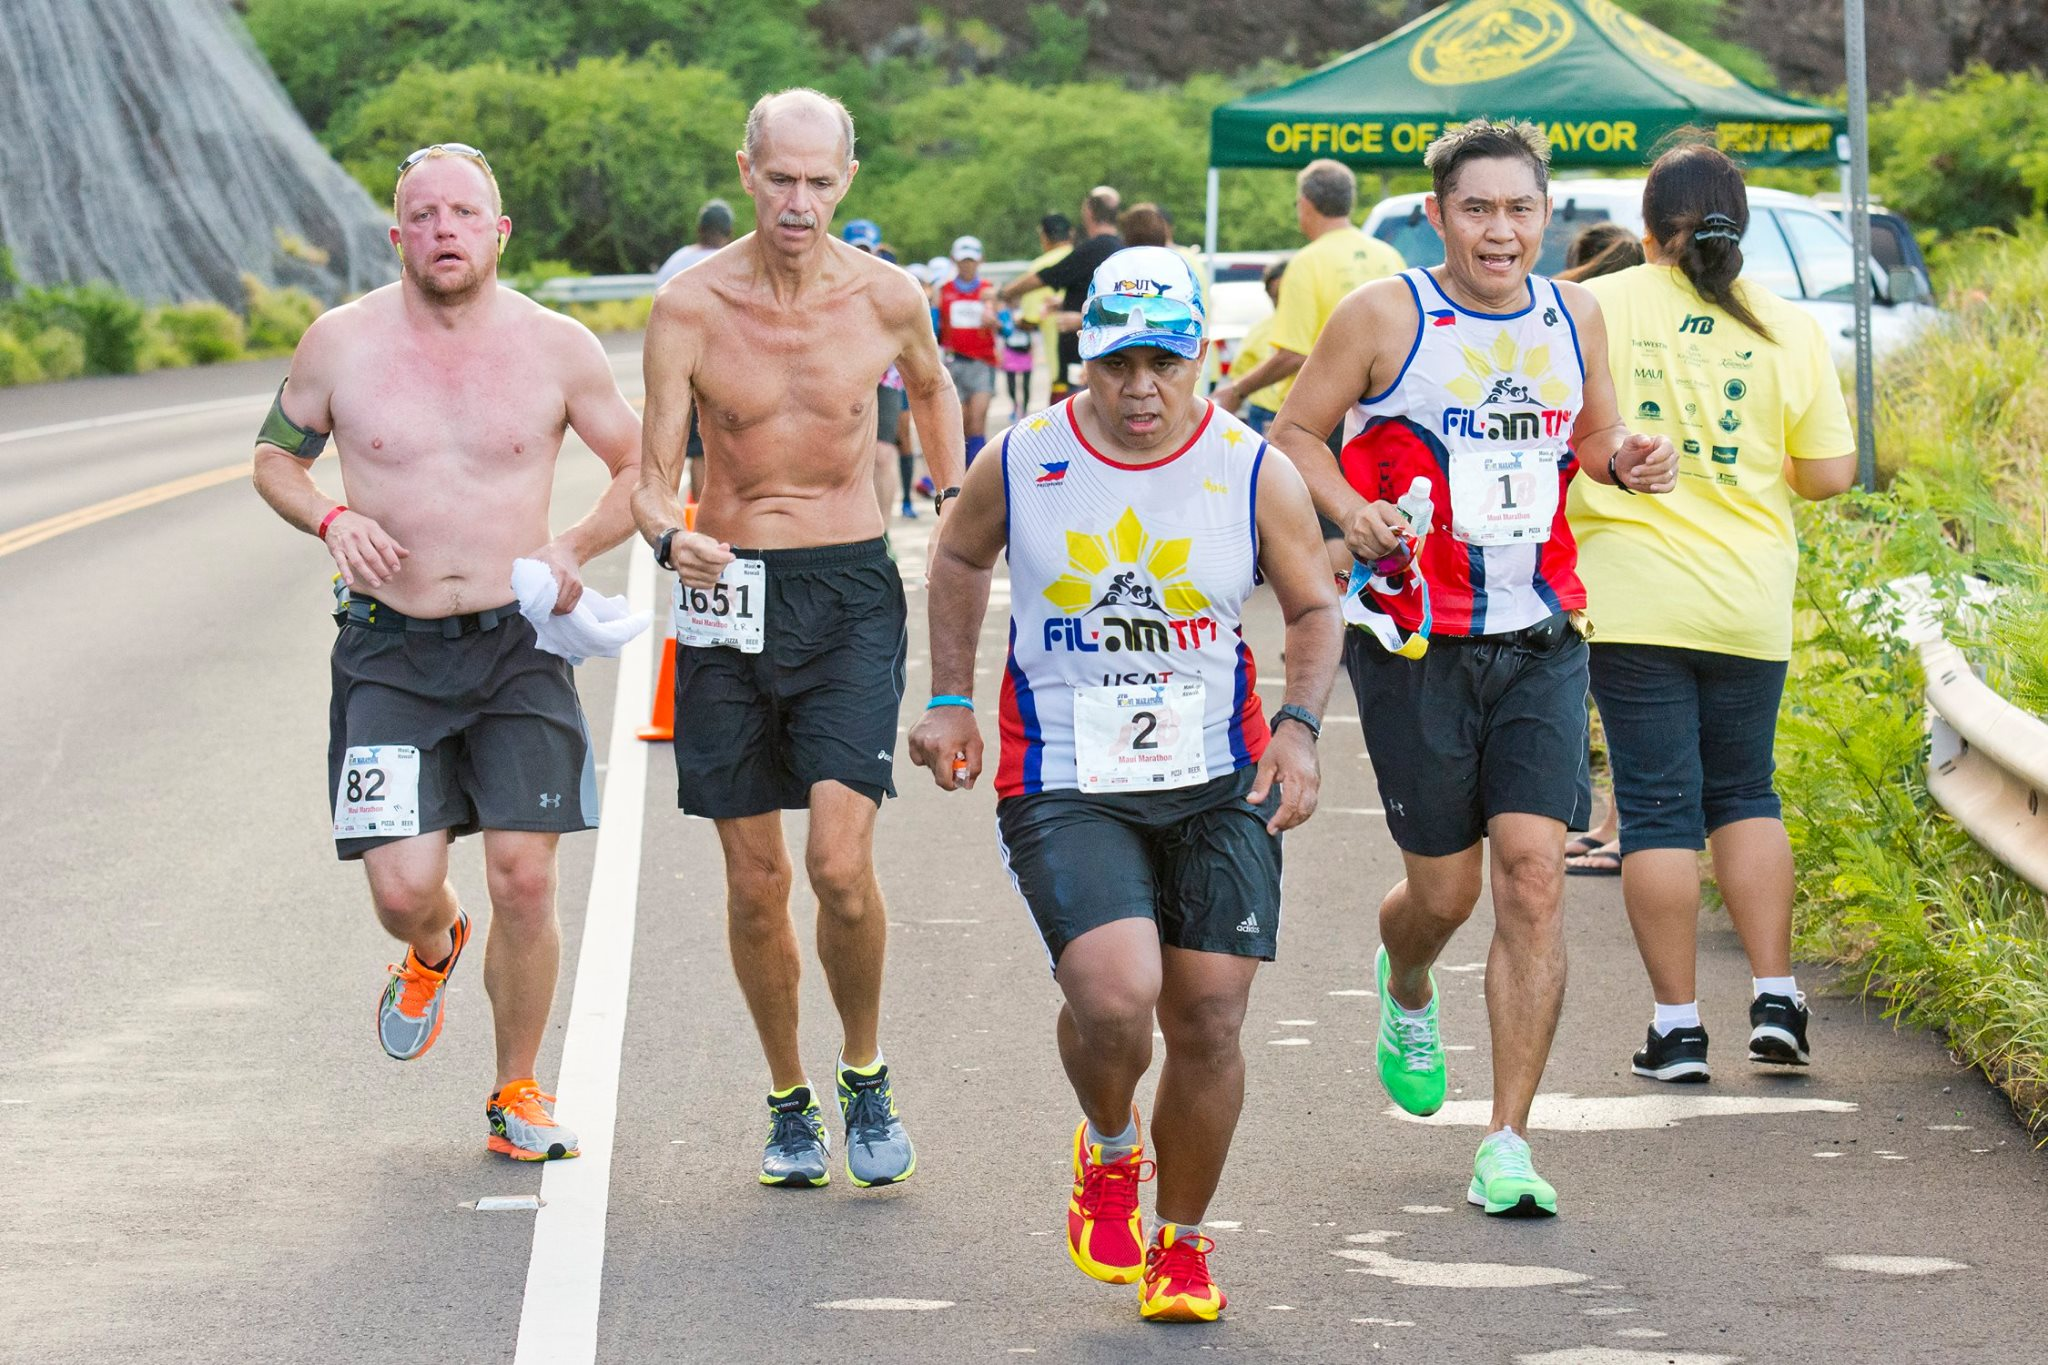 Maui Marathon Road Closures and Traffic Delays, Oct. 14